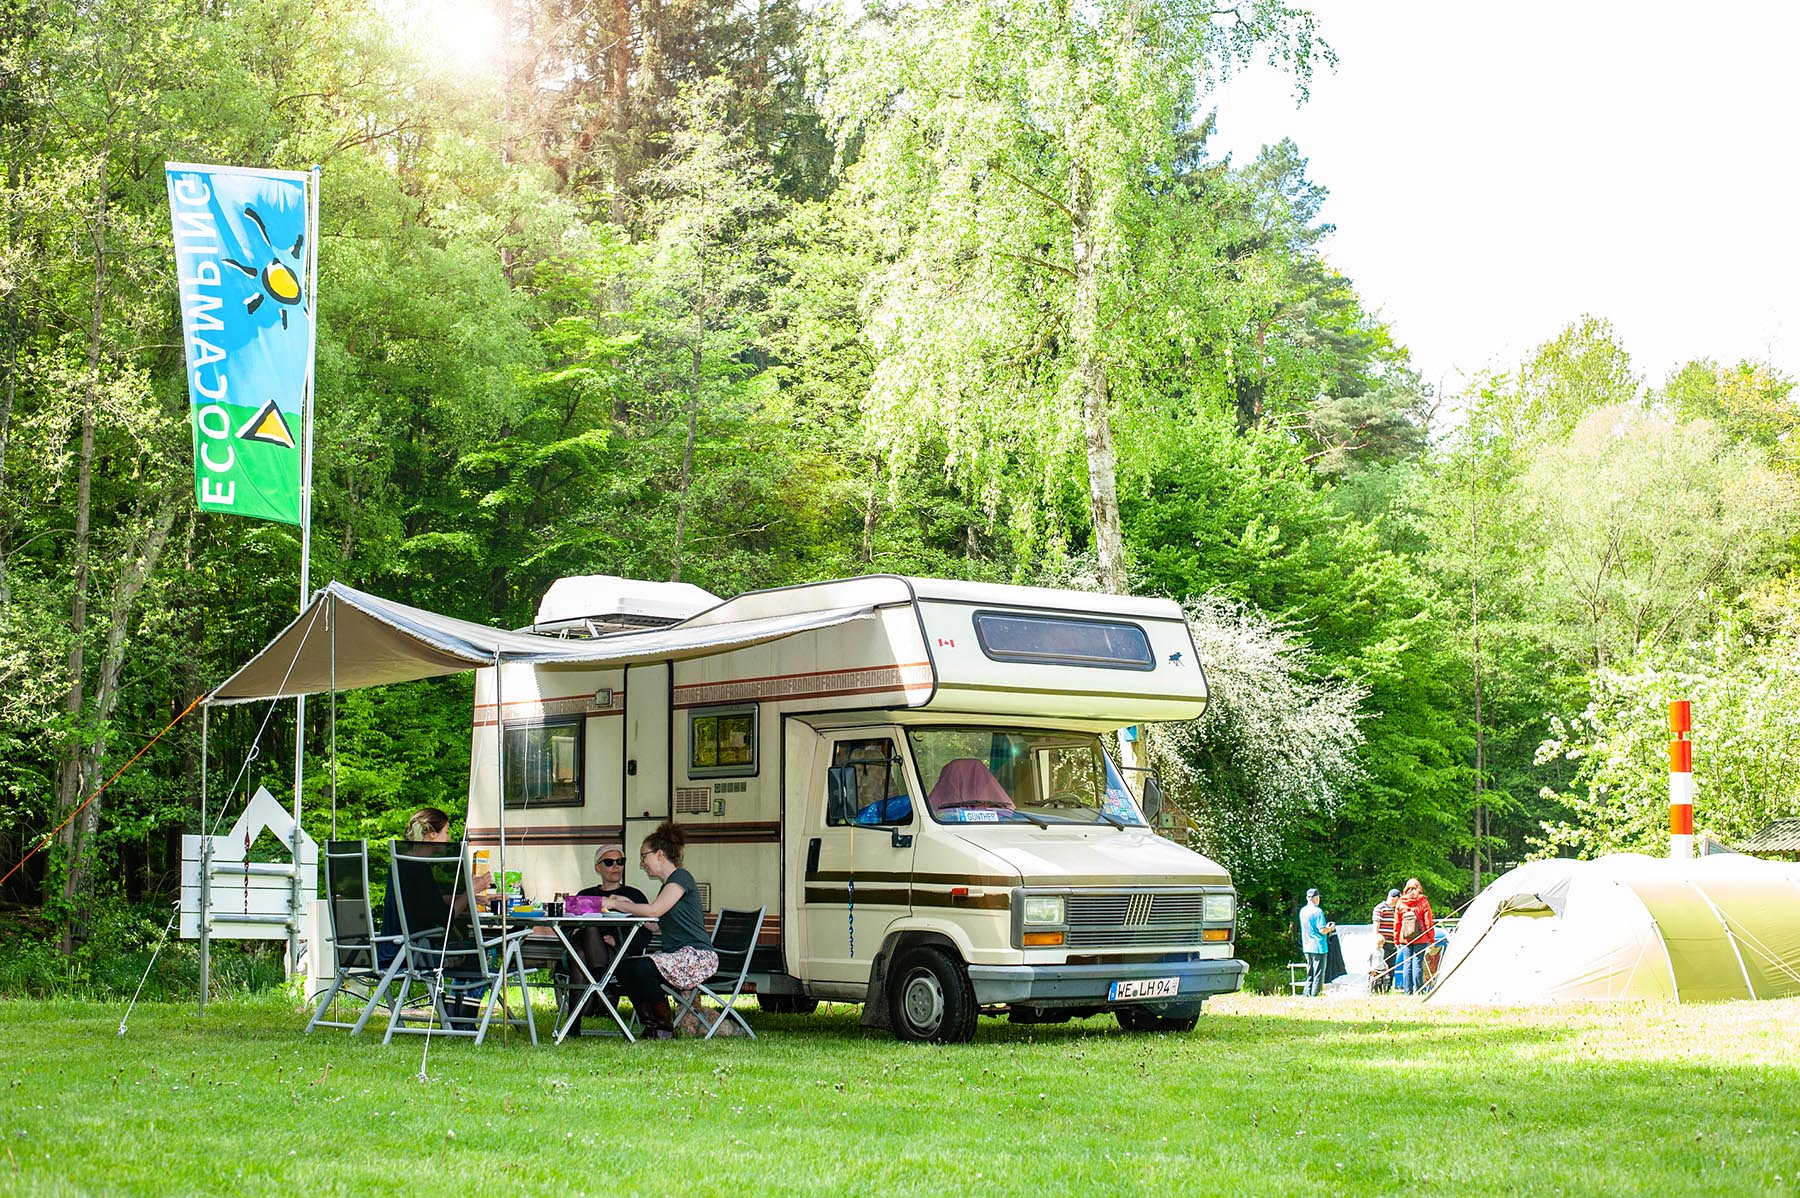 Fiat Wohnmobil Campingplatz